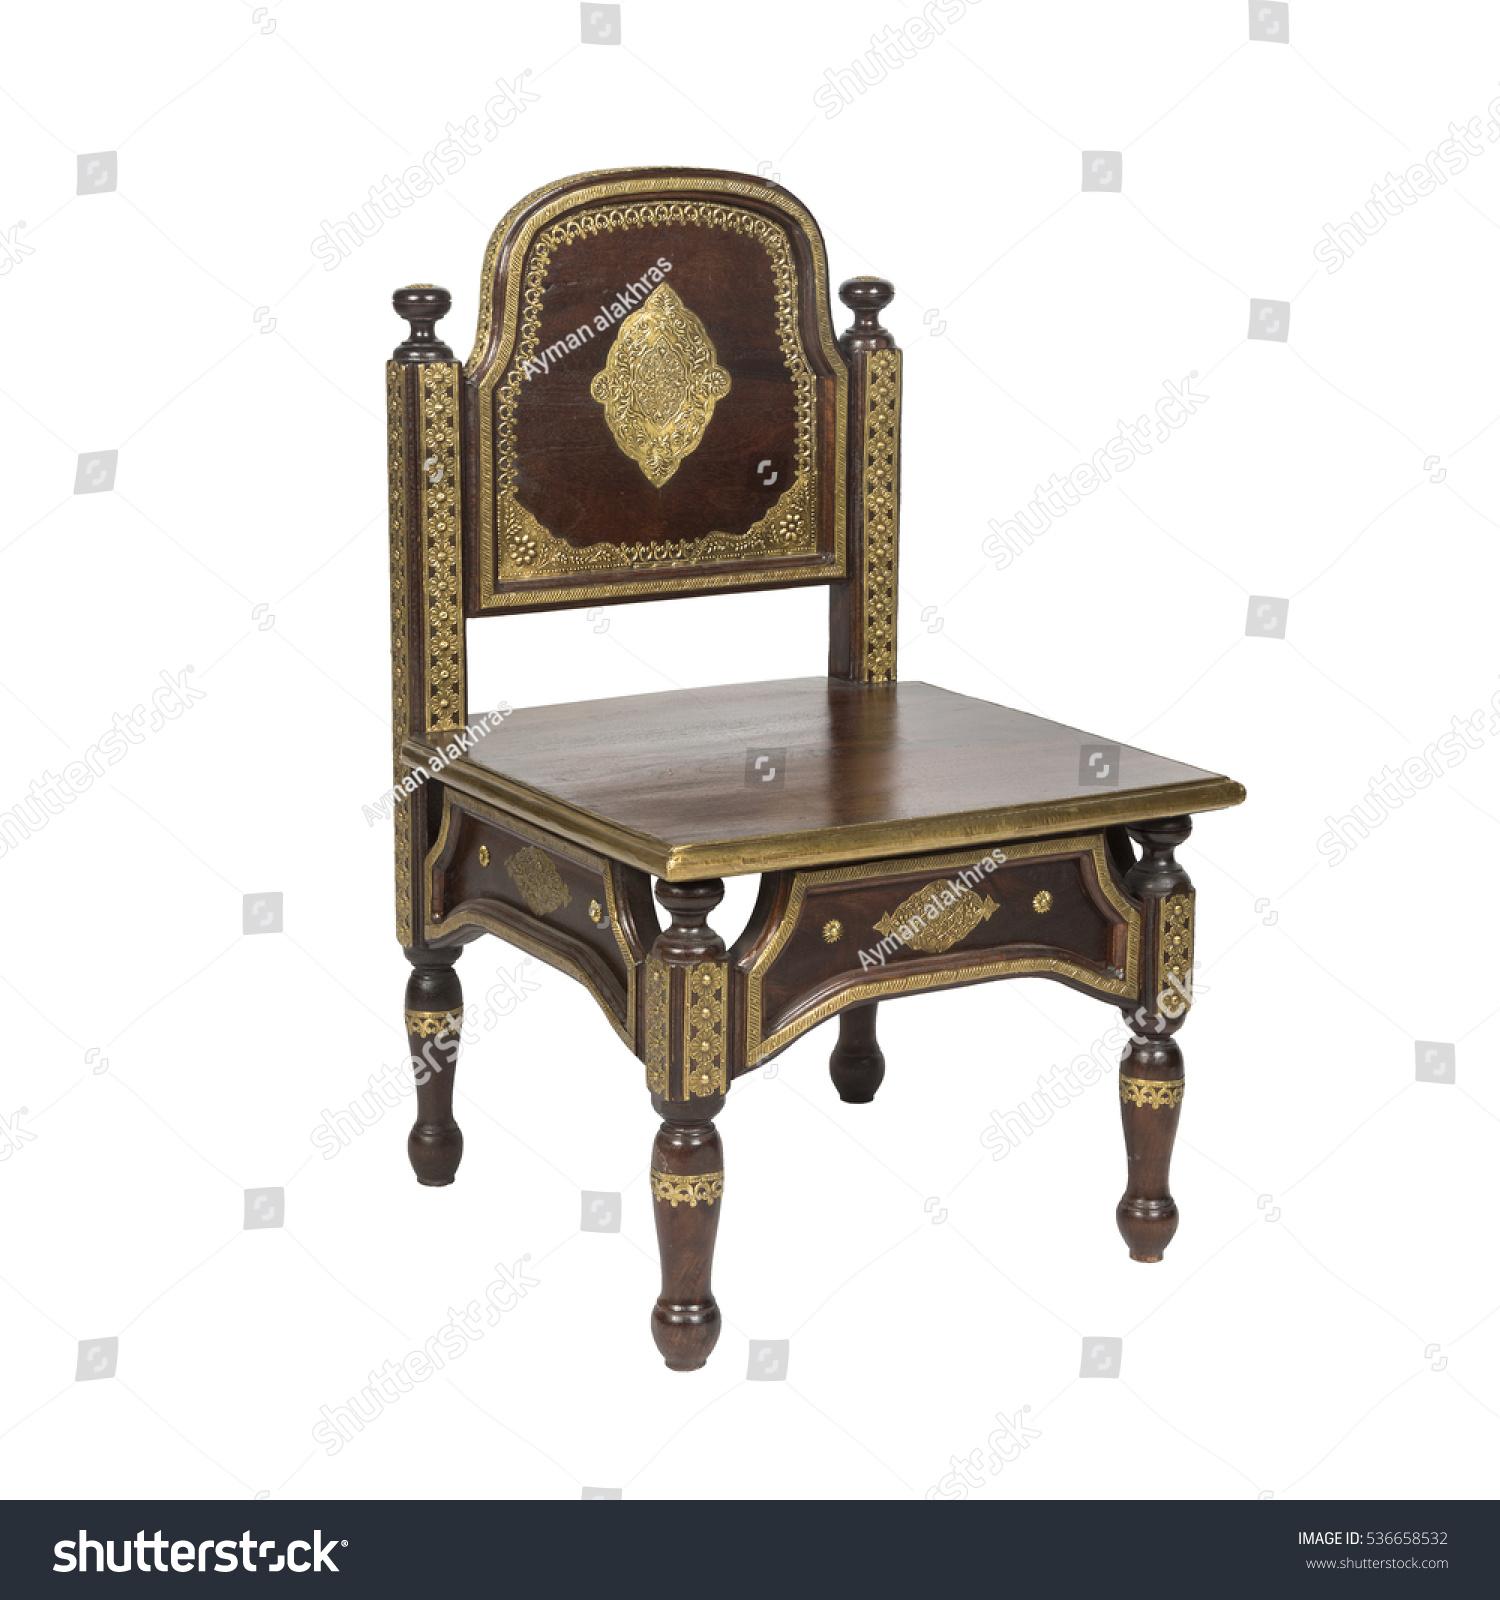 Retro Arabesque Wooden Chair Isolated Stock